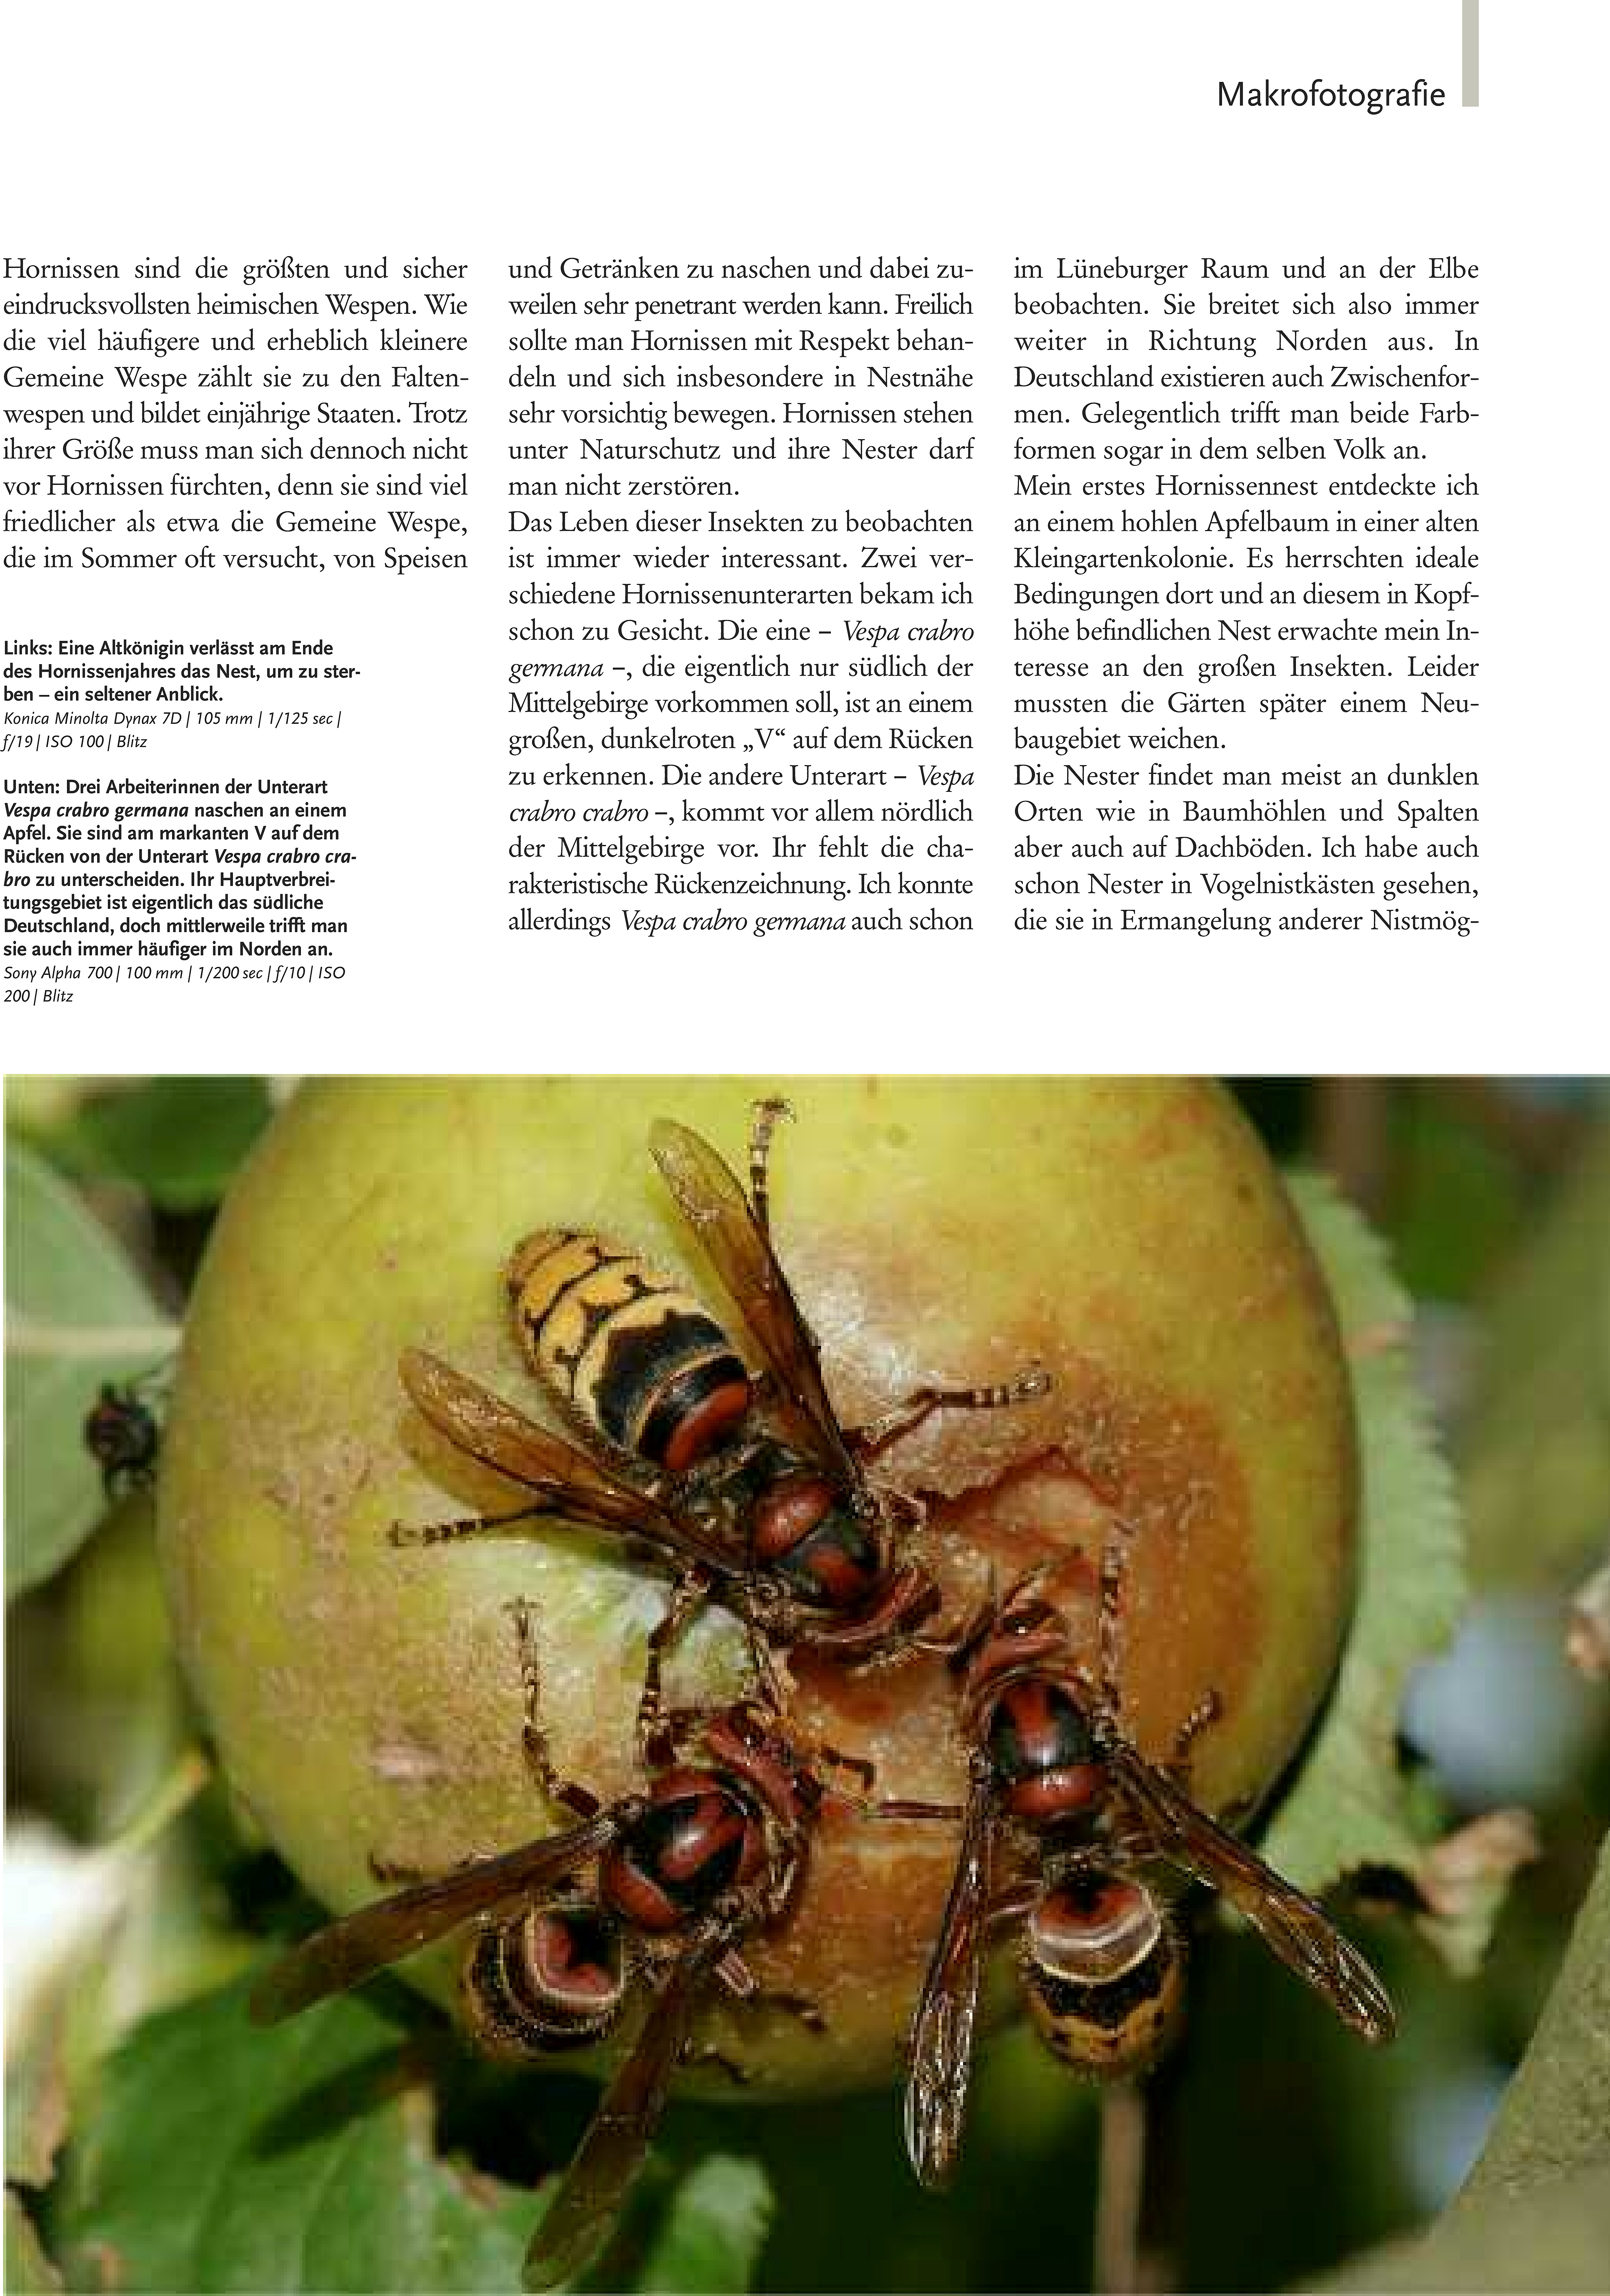 46-51 Haase Hornissen(2) Zeitschrift Natur-1